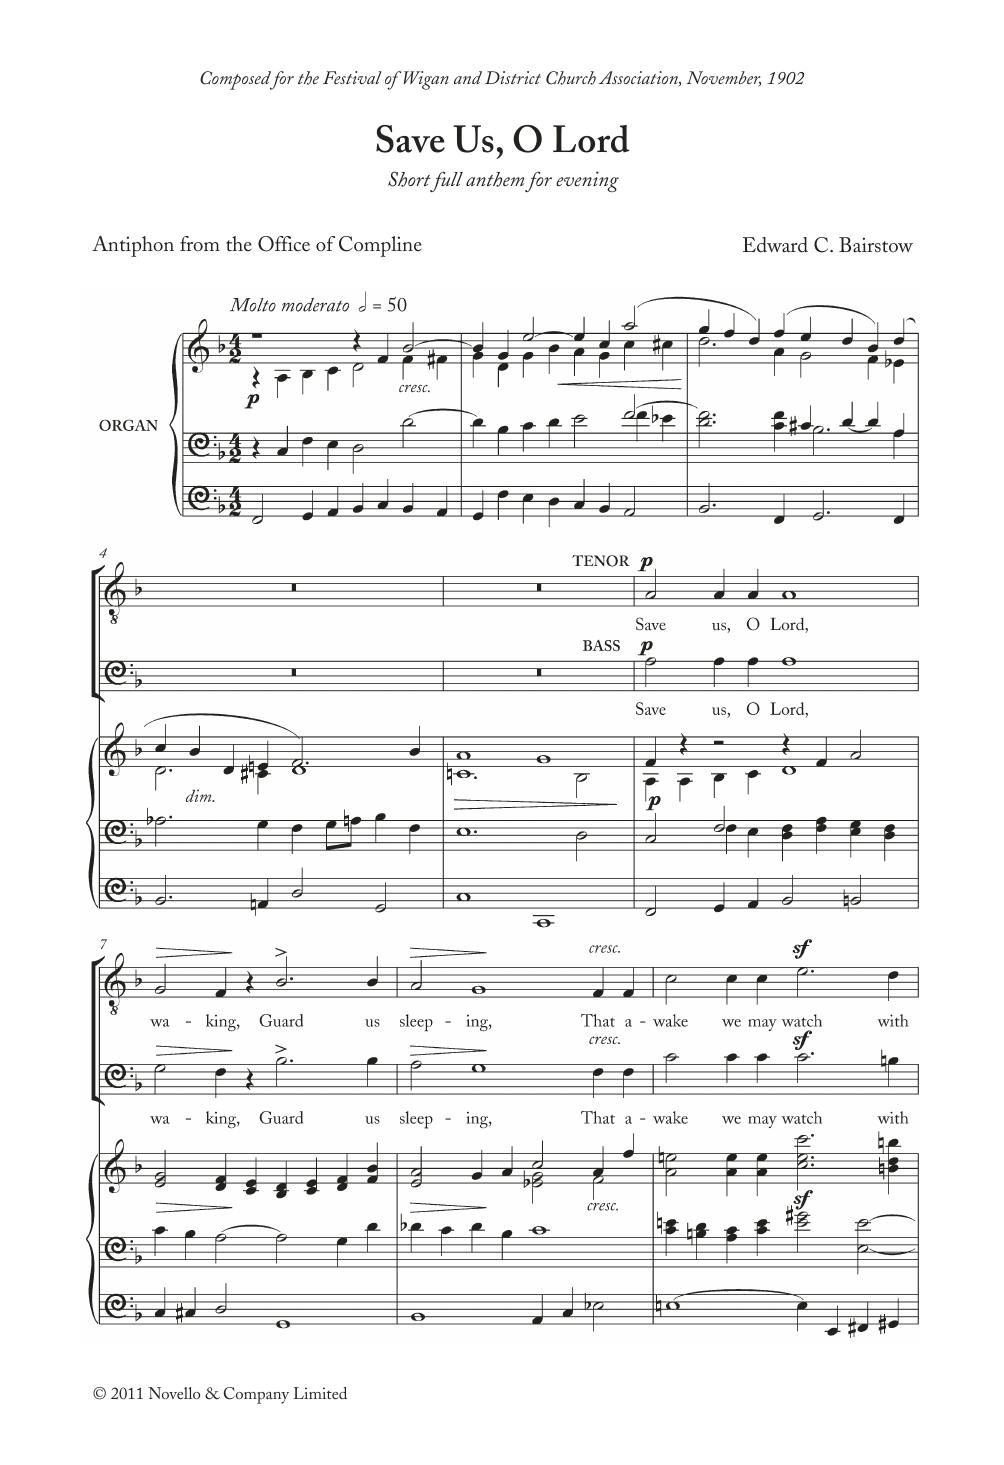 Save Us, O Lord Sheet Music